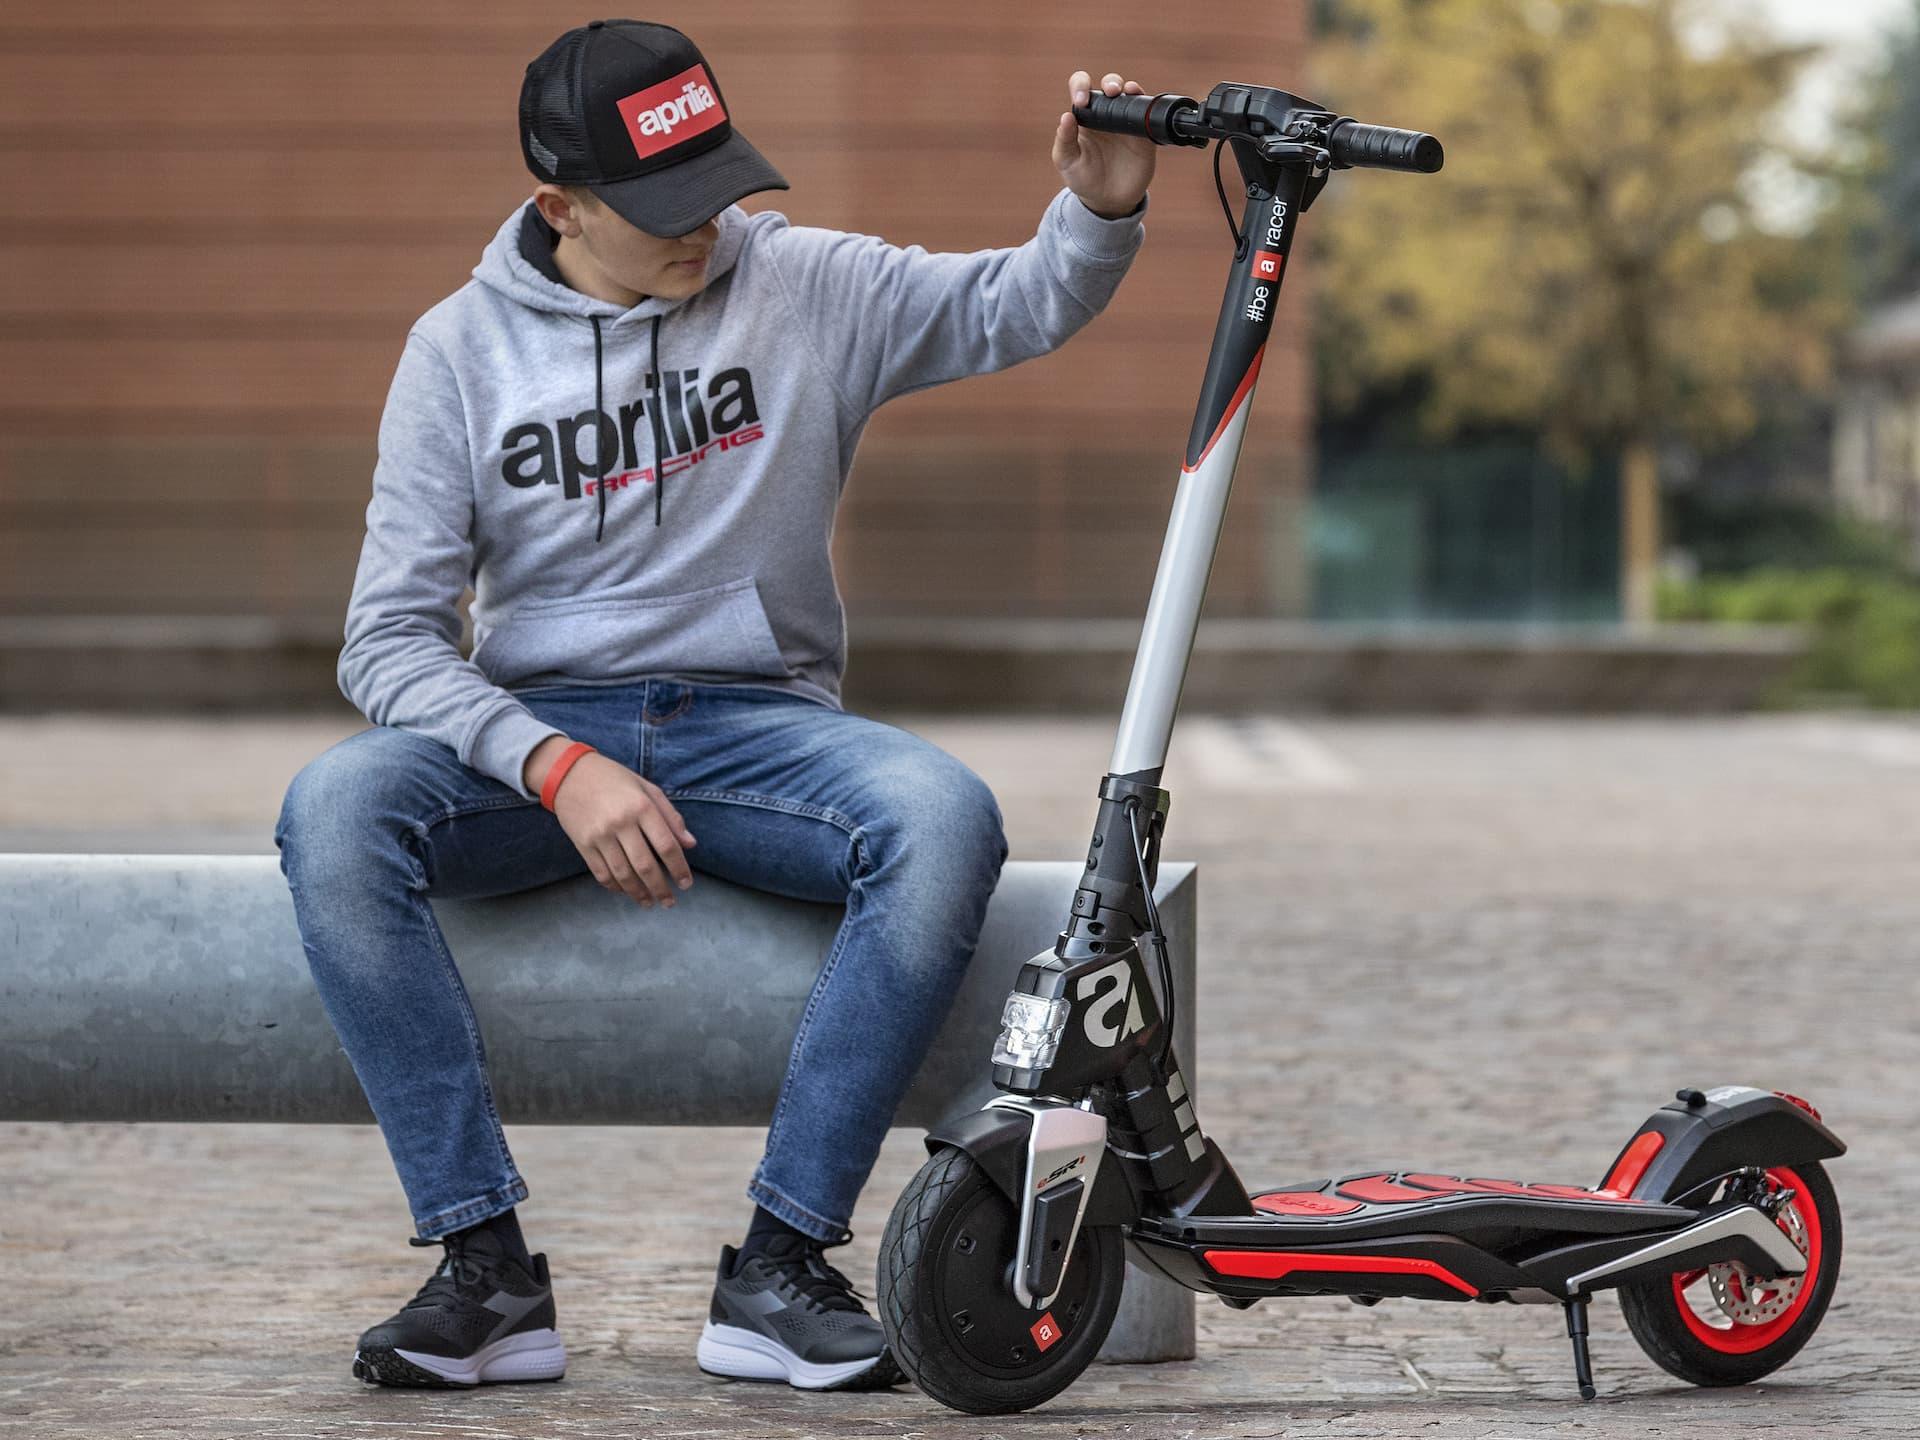 Scooter Aprilia Esr1 15